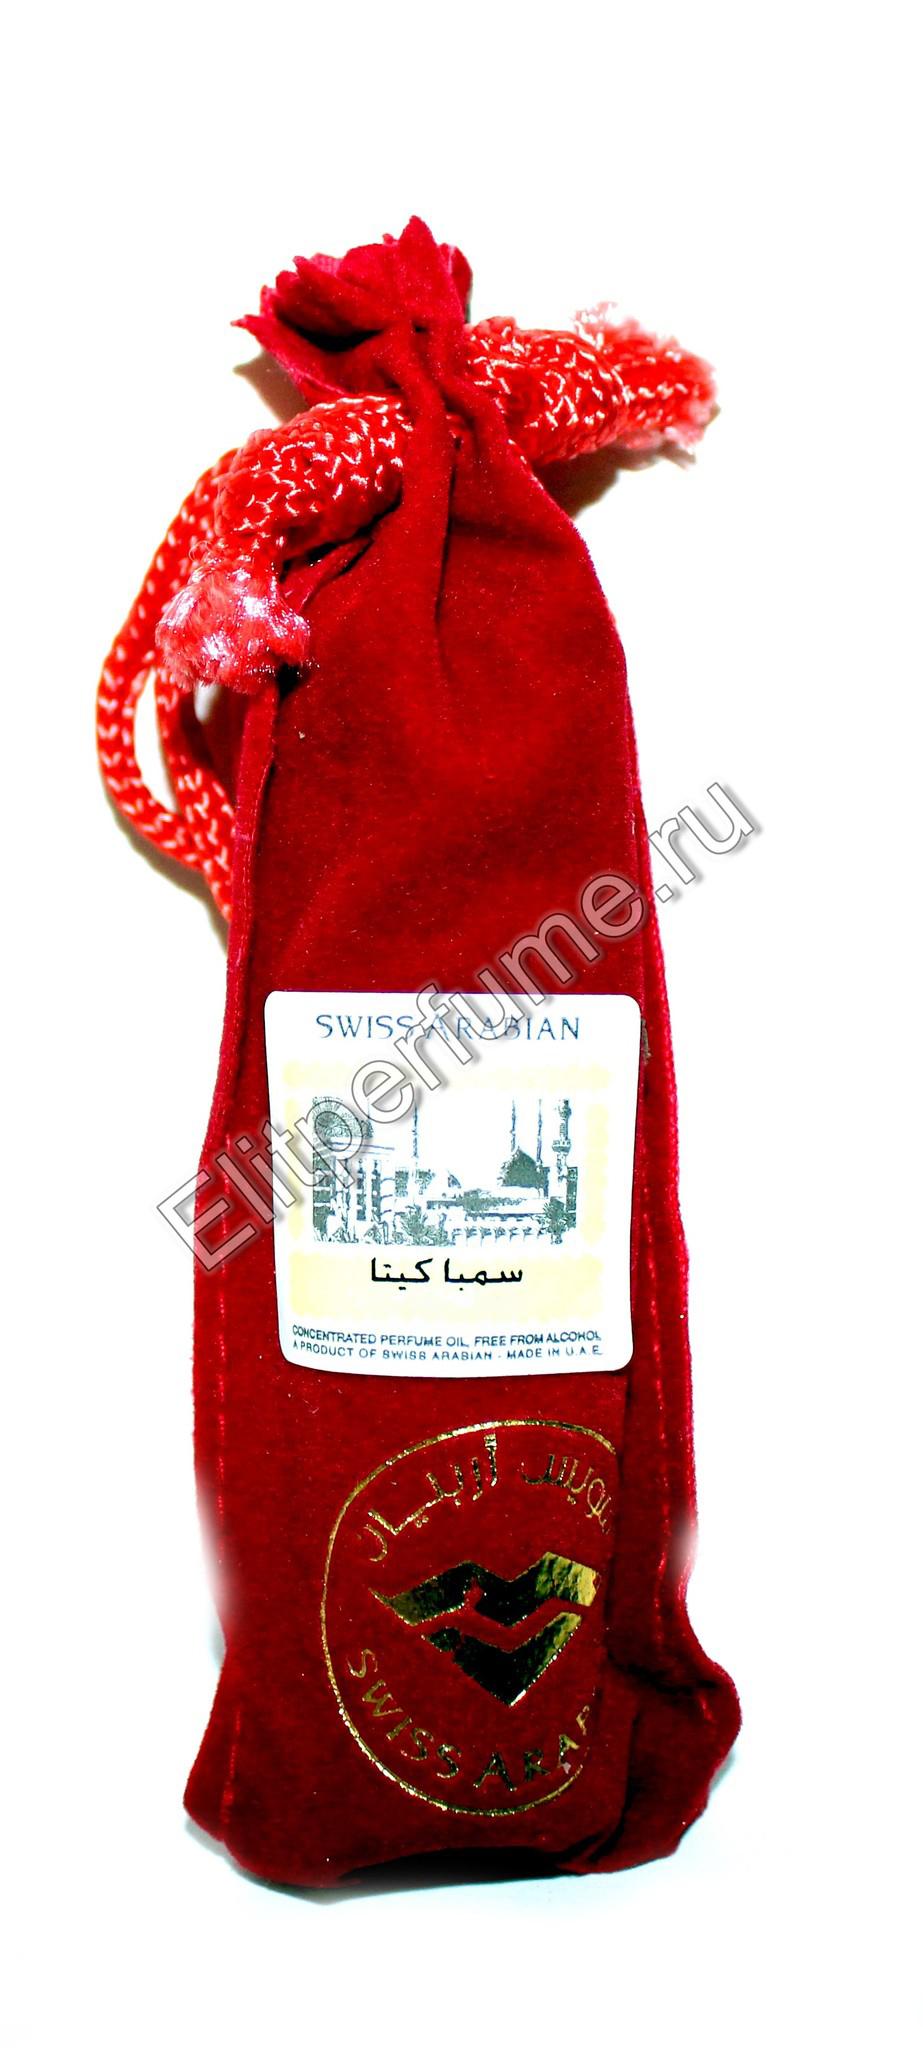 Mahbobati Mахбобати 10 мл арабские масляные духи от Свисс Арабиан Swiss Arabian